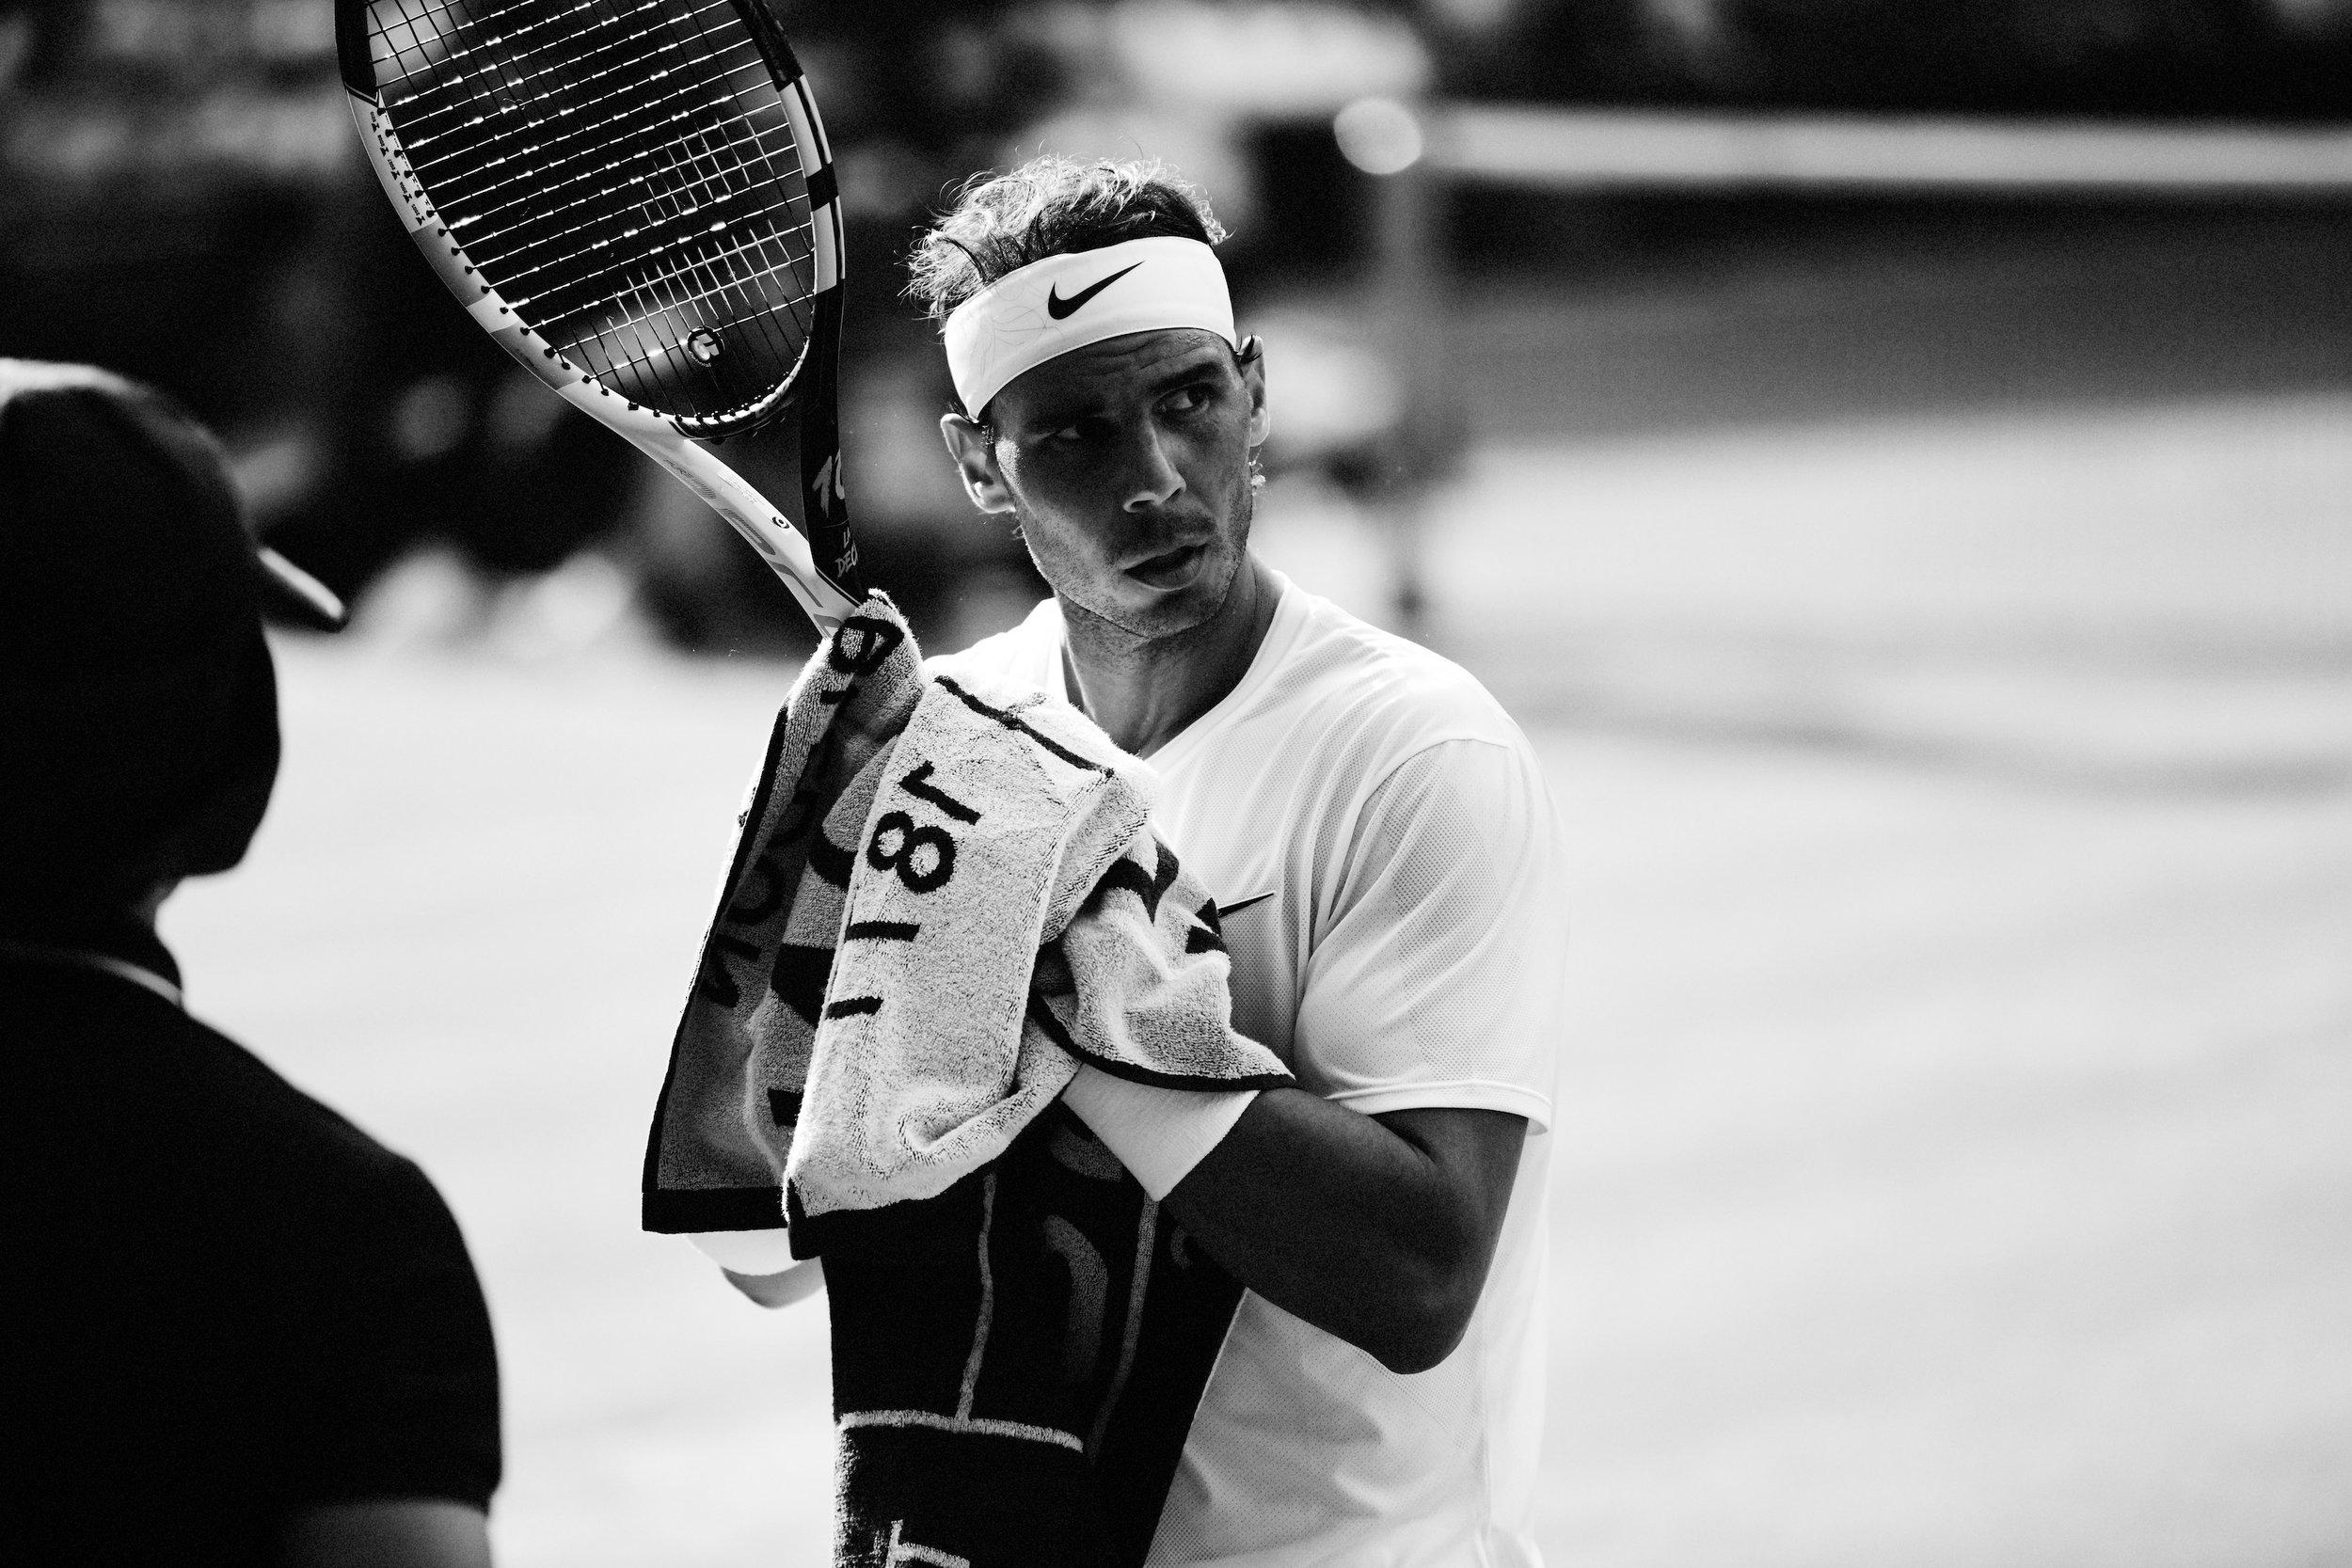 Wimbledon_New_York_Times_Stockdale25.jpg